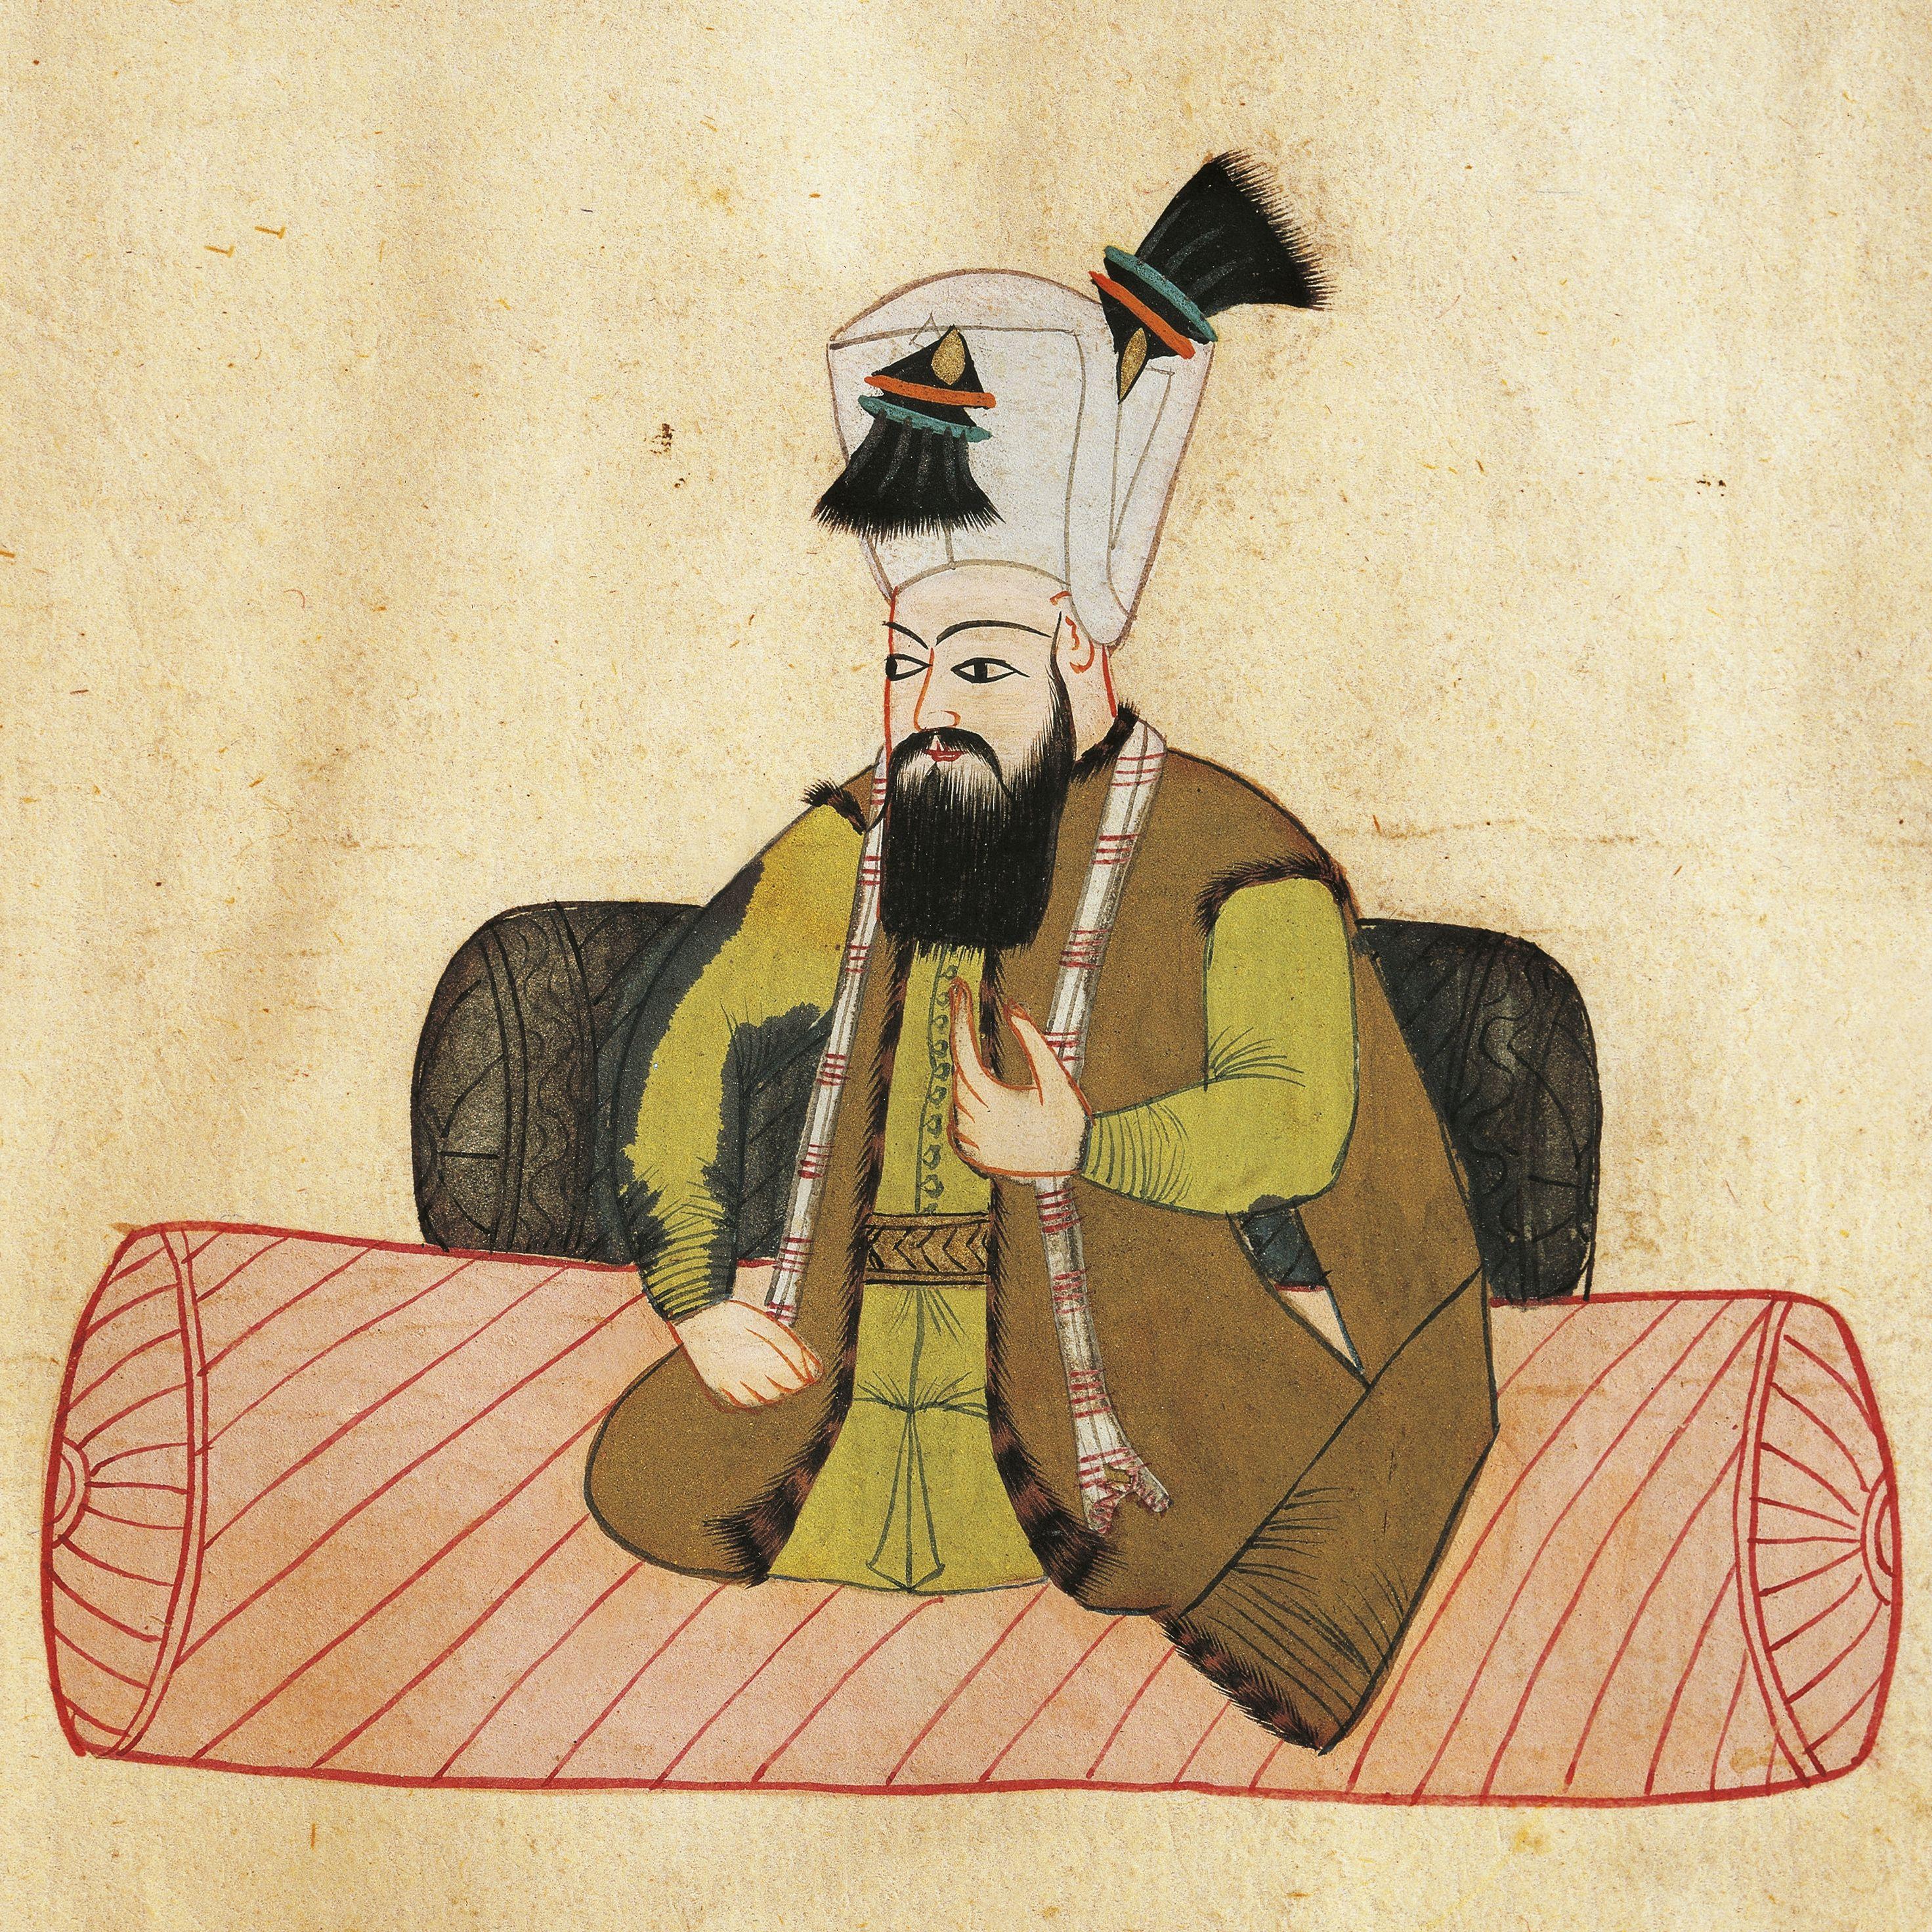 Portrait of Mustafa I (Manisa, 1592 - Istanbul, 1639), Sultan of Ottoman Empire, illustration from Turkish Memories, Arabic manuscript, Cicogna Codex, 17th century